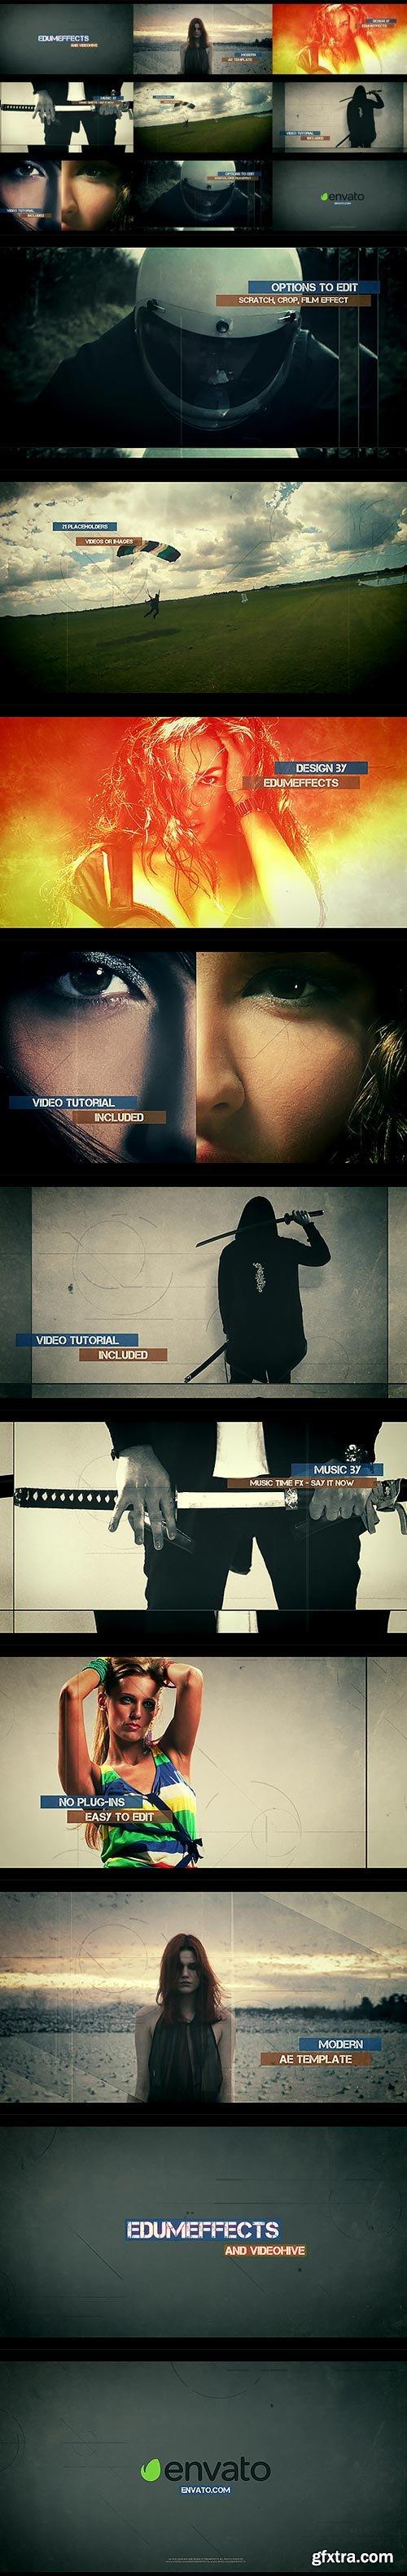 Videohive - Versatile Grunge Trailer - 8286091